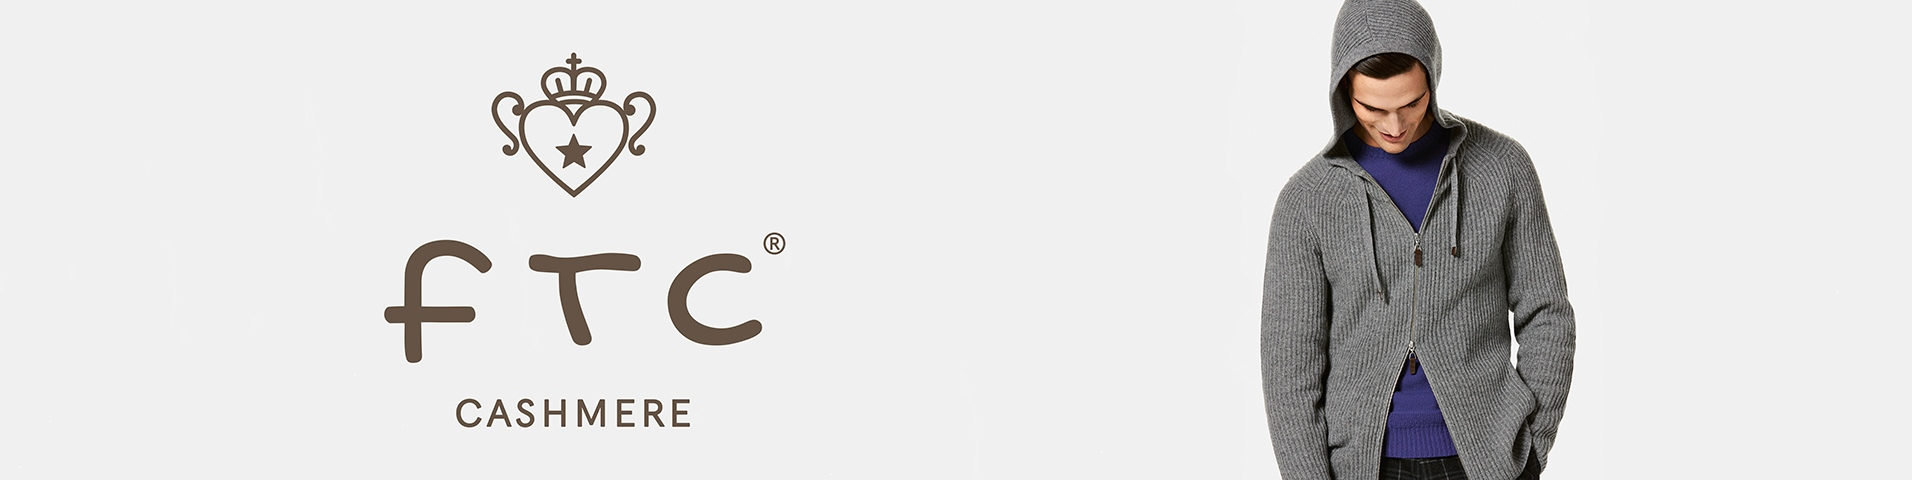 Saldi FTC Cashmere | Acquista su Zalando